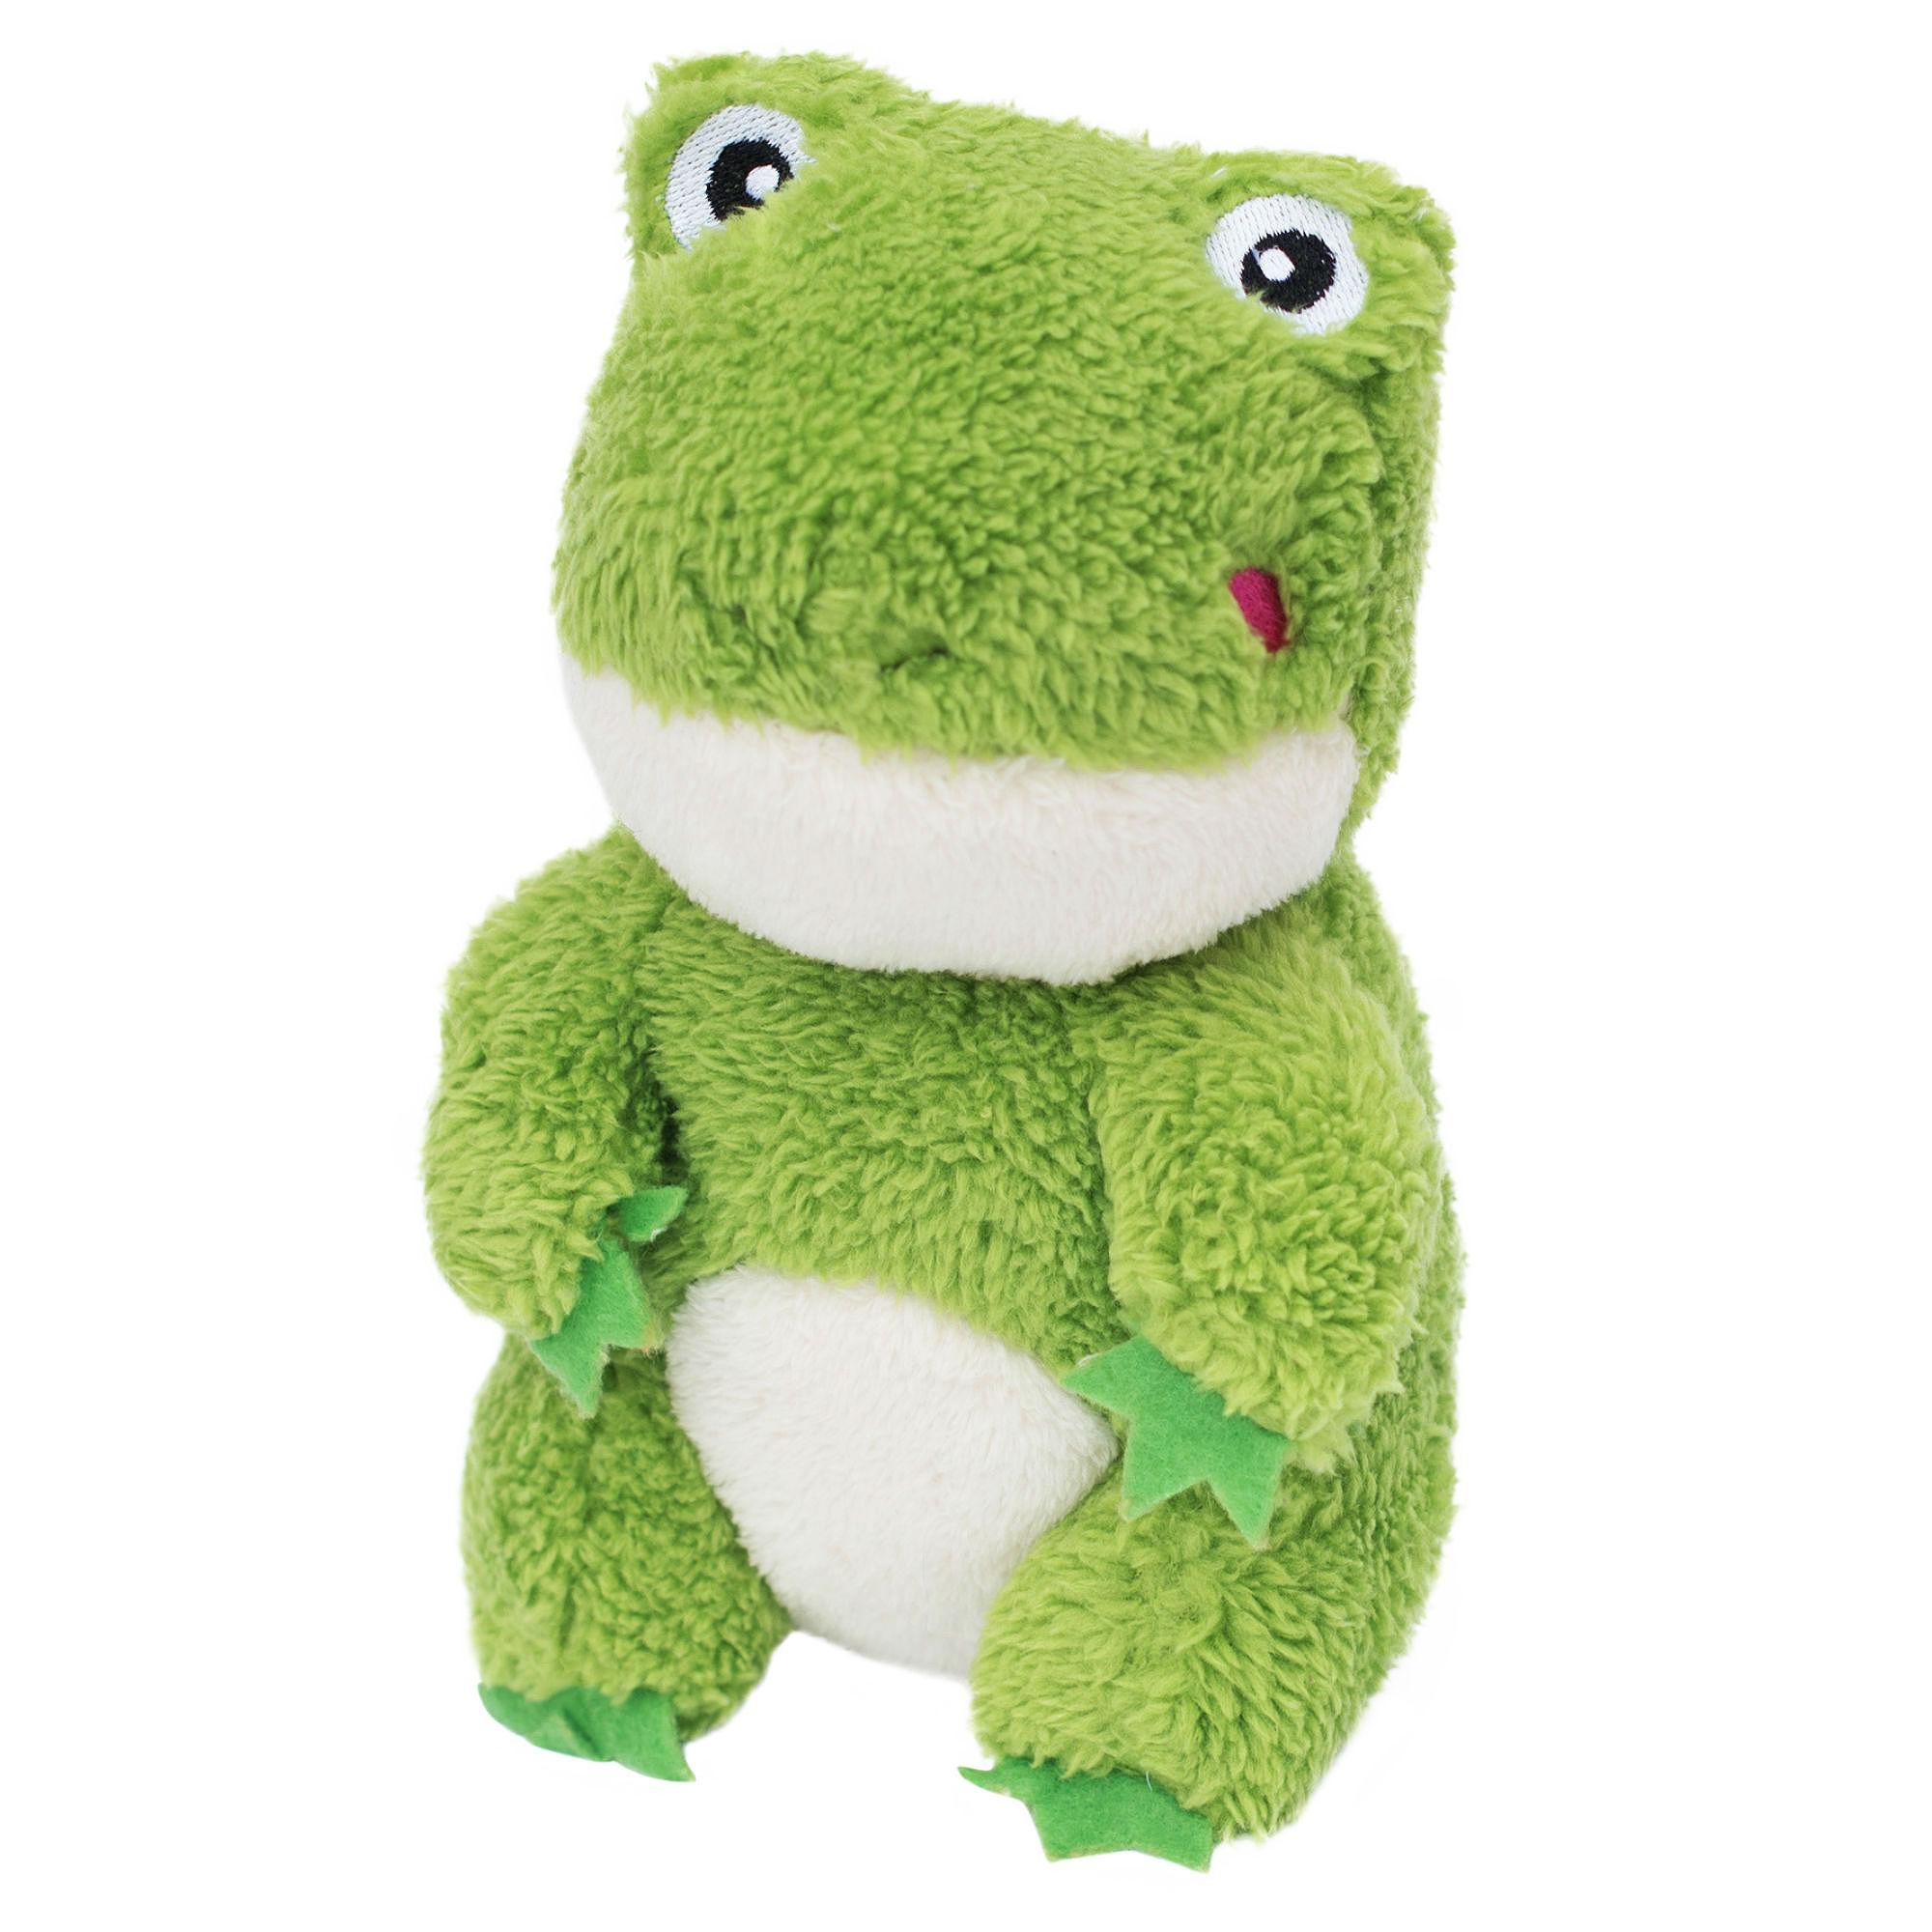 ZippyPaws Cheeky Chumz Dog Toy - Frog